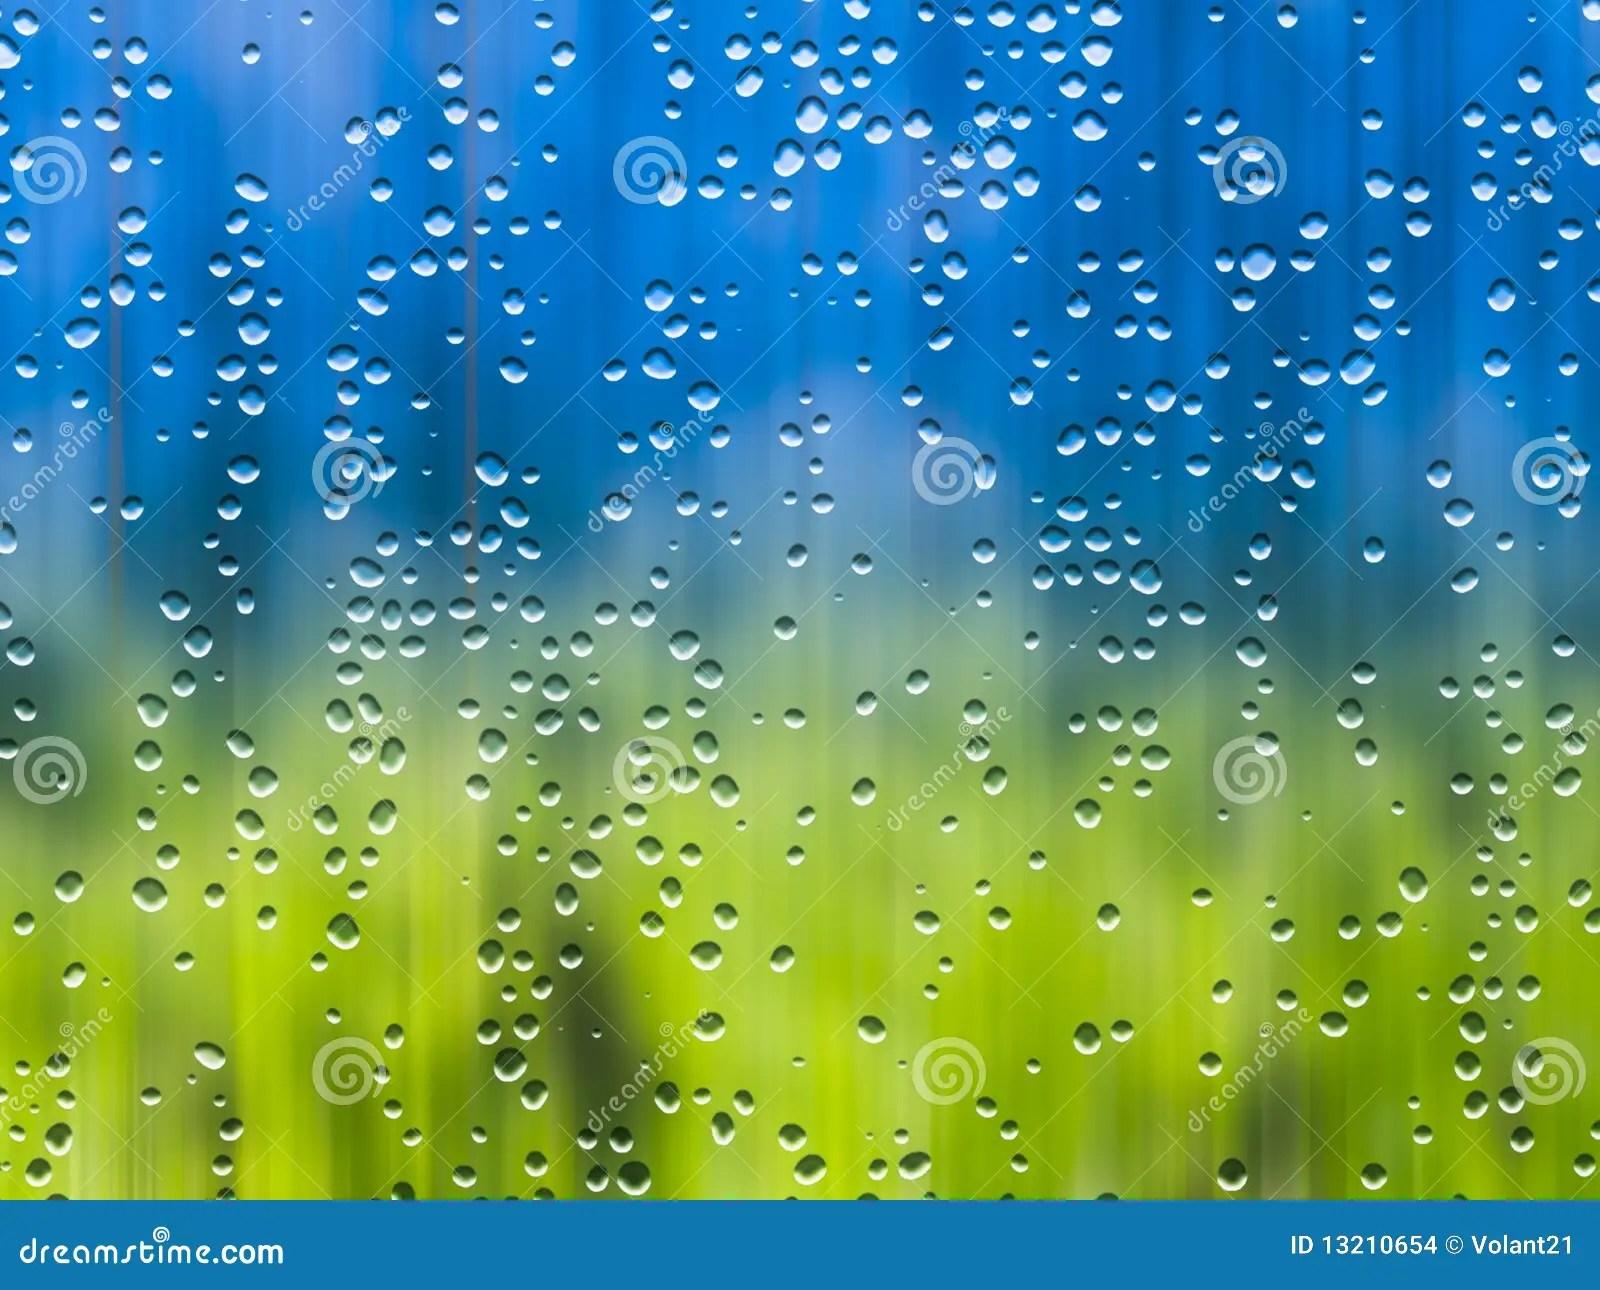 Images Of Fall Season Wallpaper Rain During Sunshine Stock Images Image 13210654